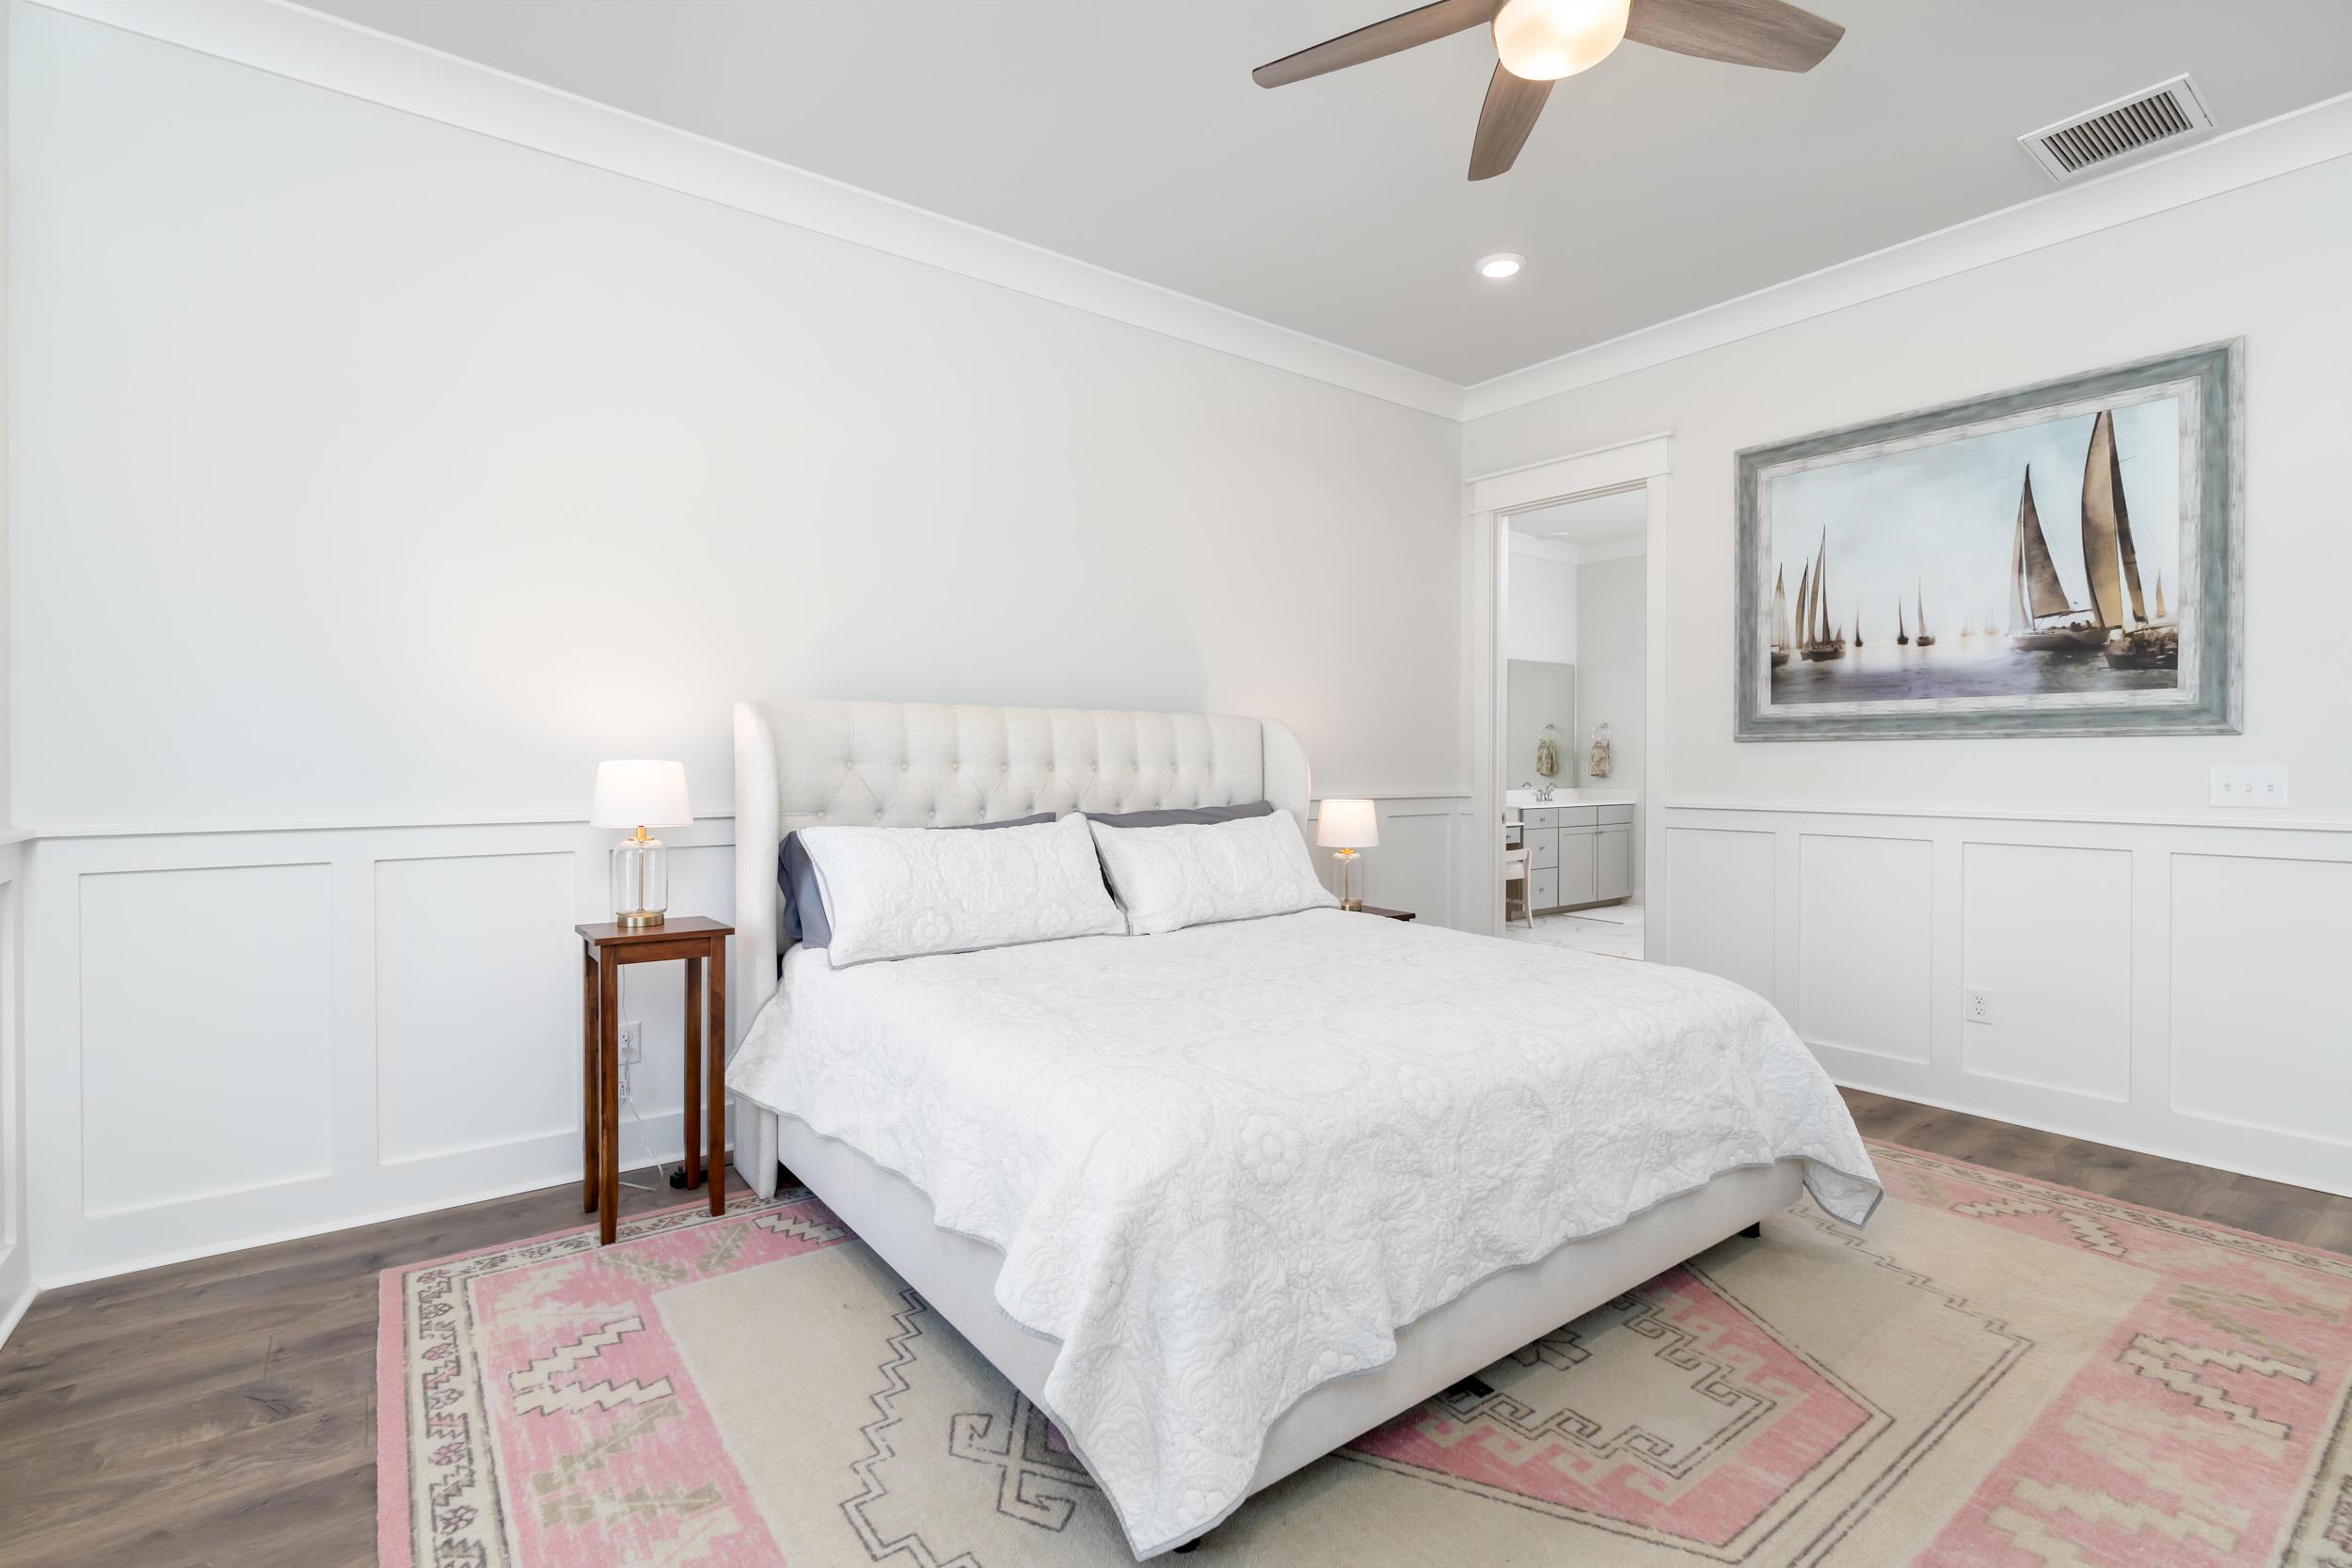 Hamlin Oaks Homes For Sale - 2921 Tranquility, Mount Pleasant, SC - 12